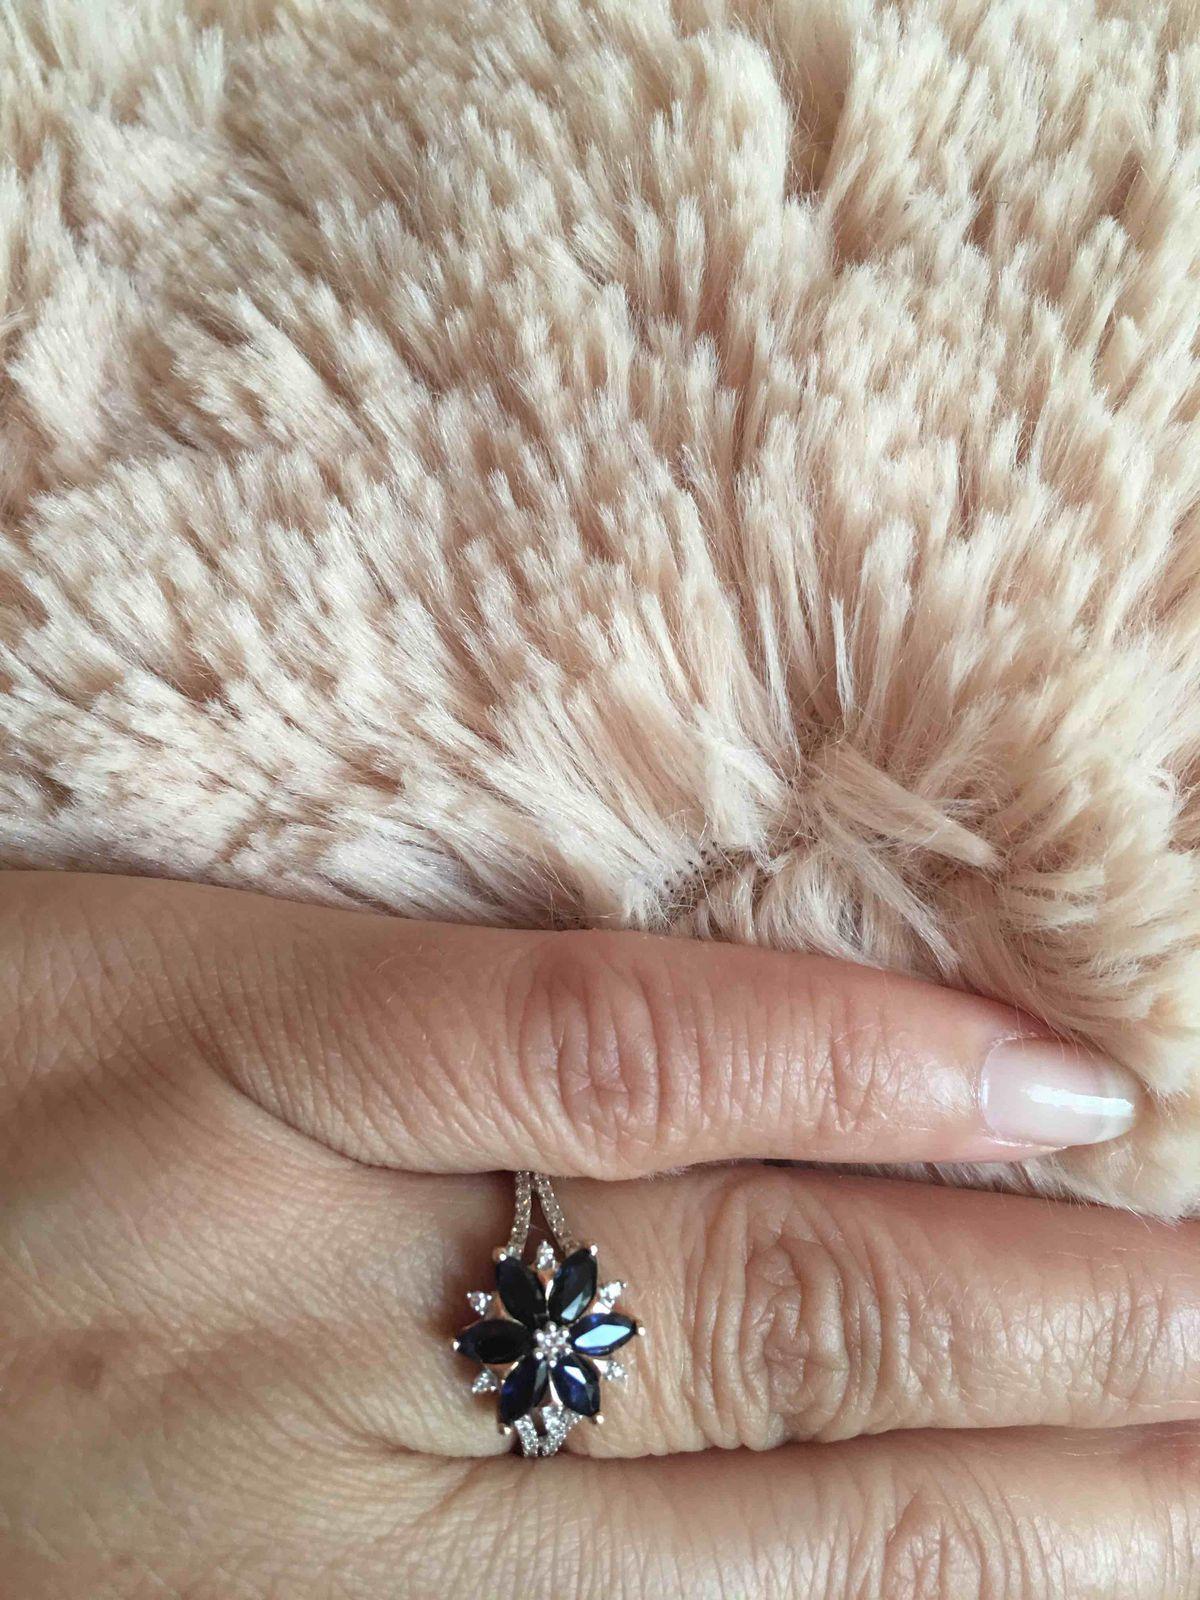 Кольцо с синеньким сапфиром